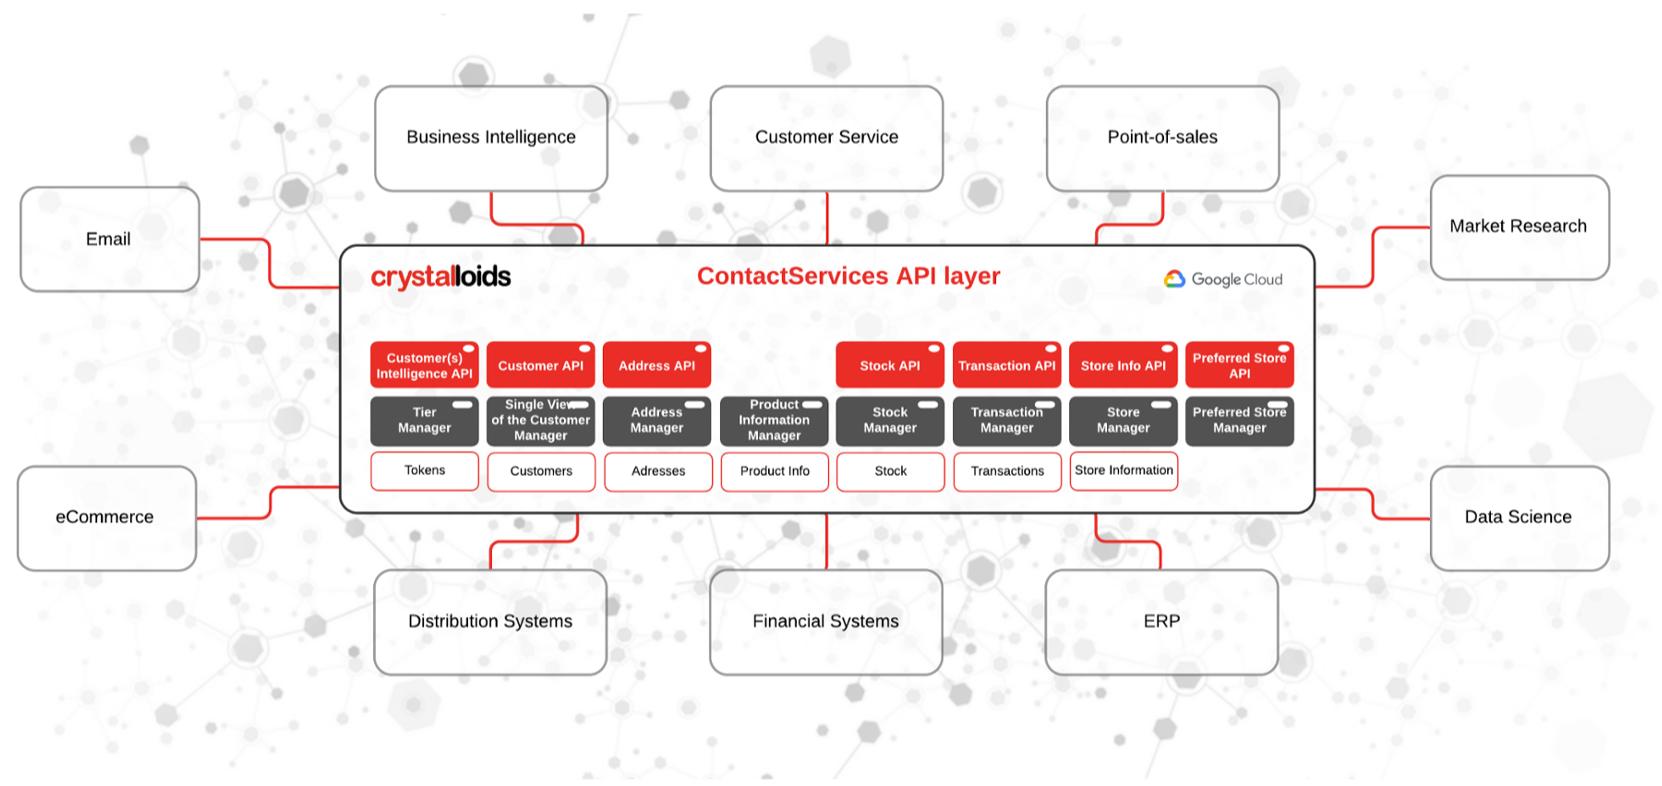 ContactServices API